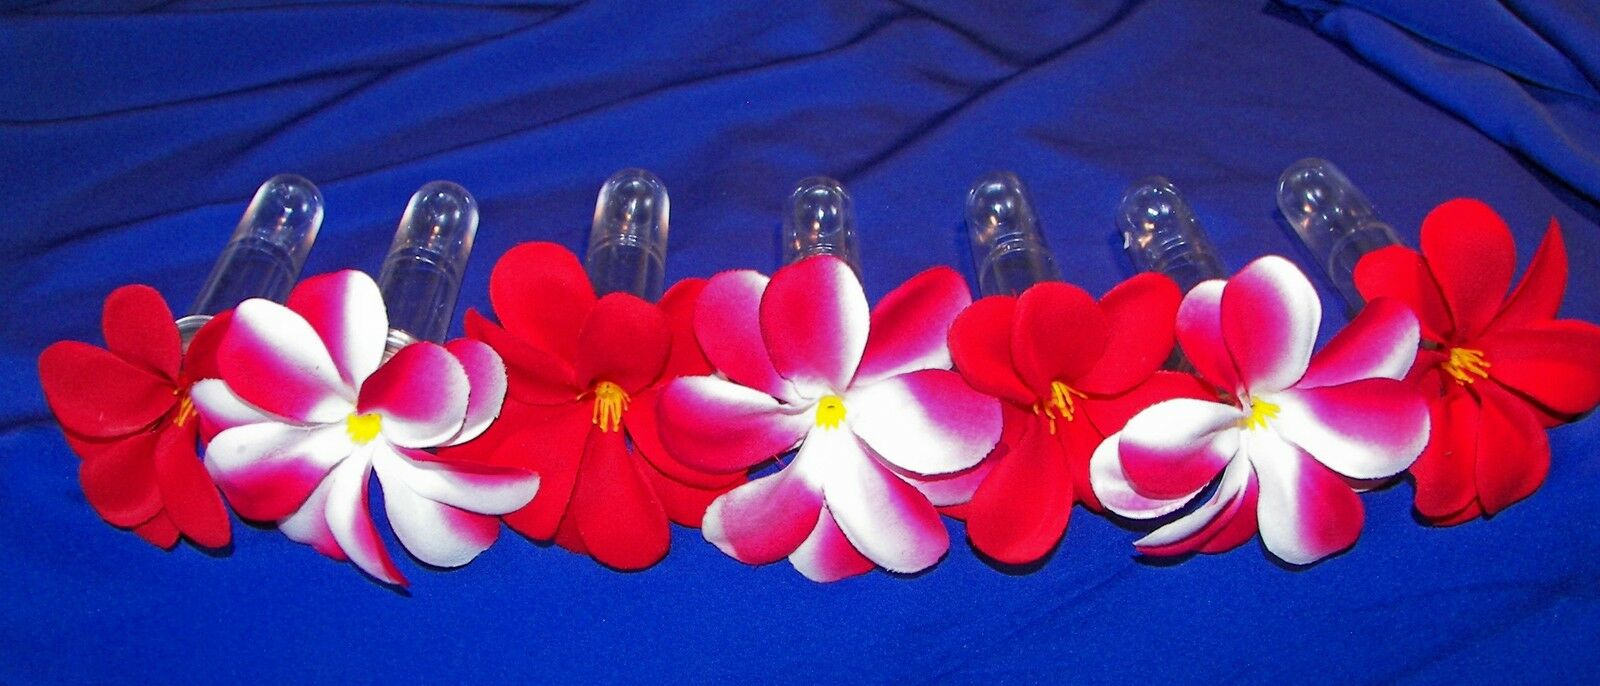 7 hummingbird feeder replacement tubes 3 inch silk plumeria flowers picture 1 of 1 mightylinksfo